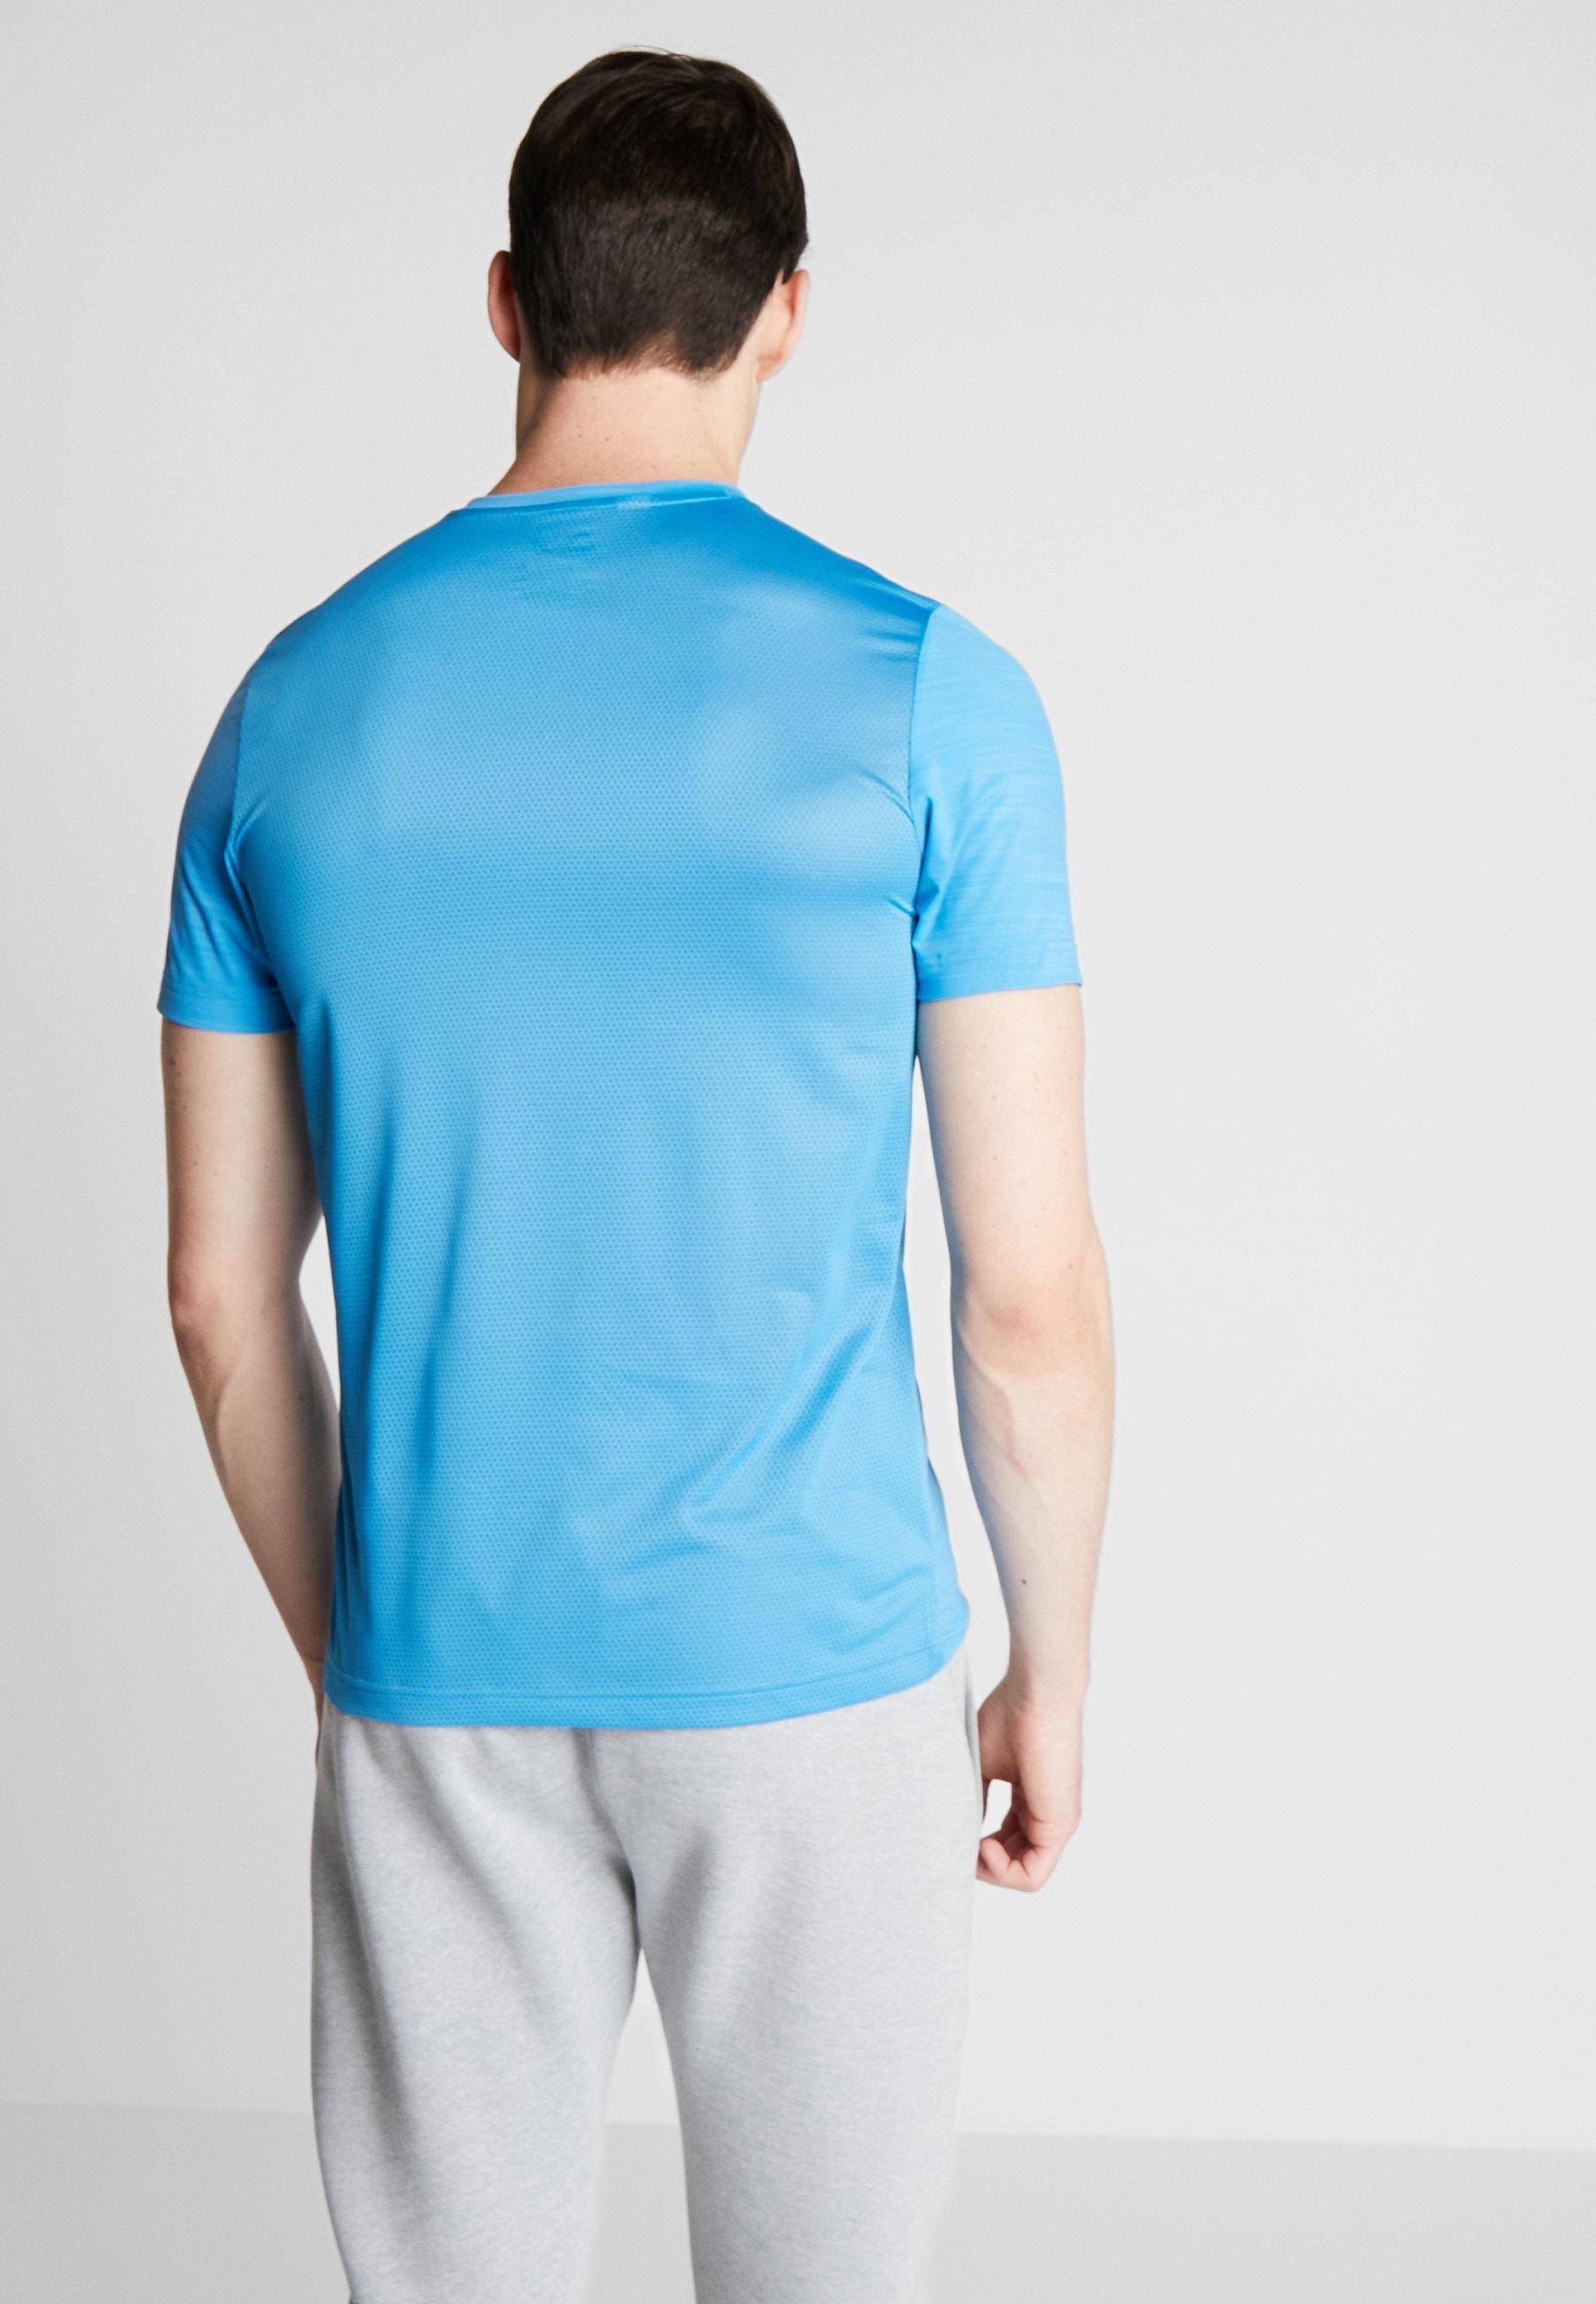 shirt Cyan GraphicT Imprimé Activchill Reebok N8OXknw0P